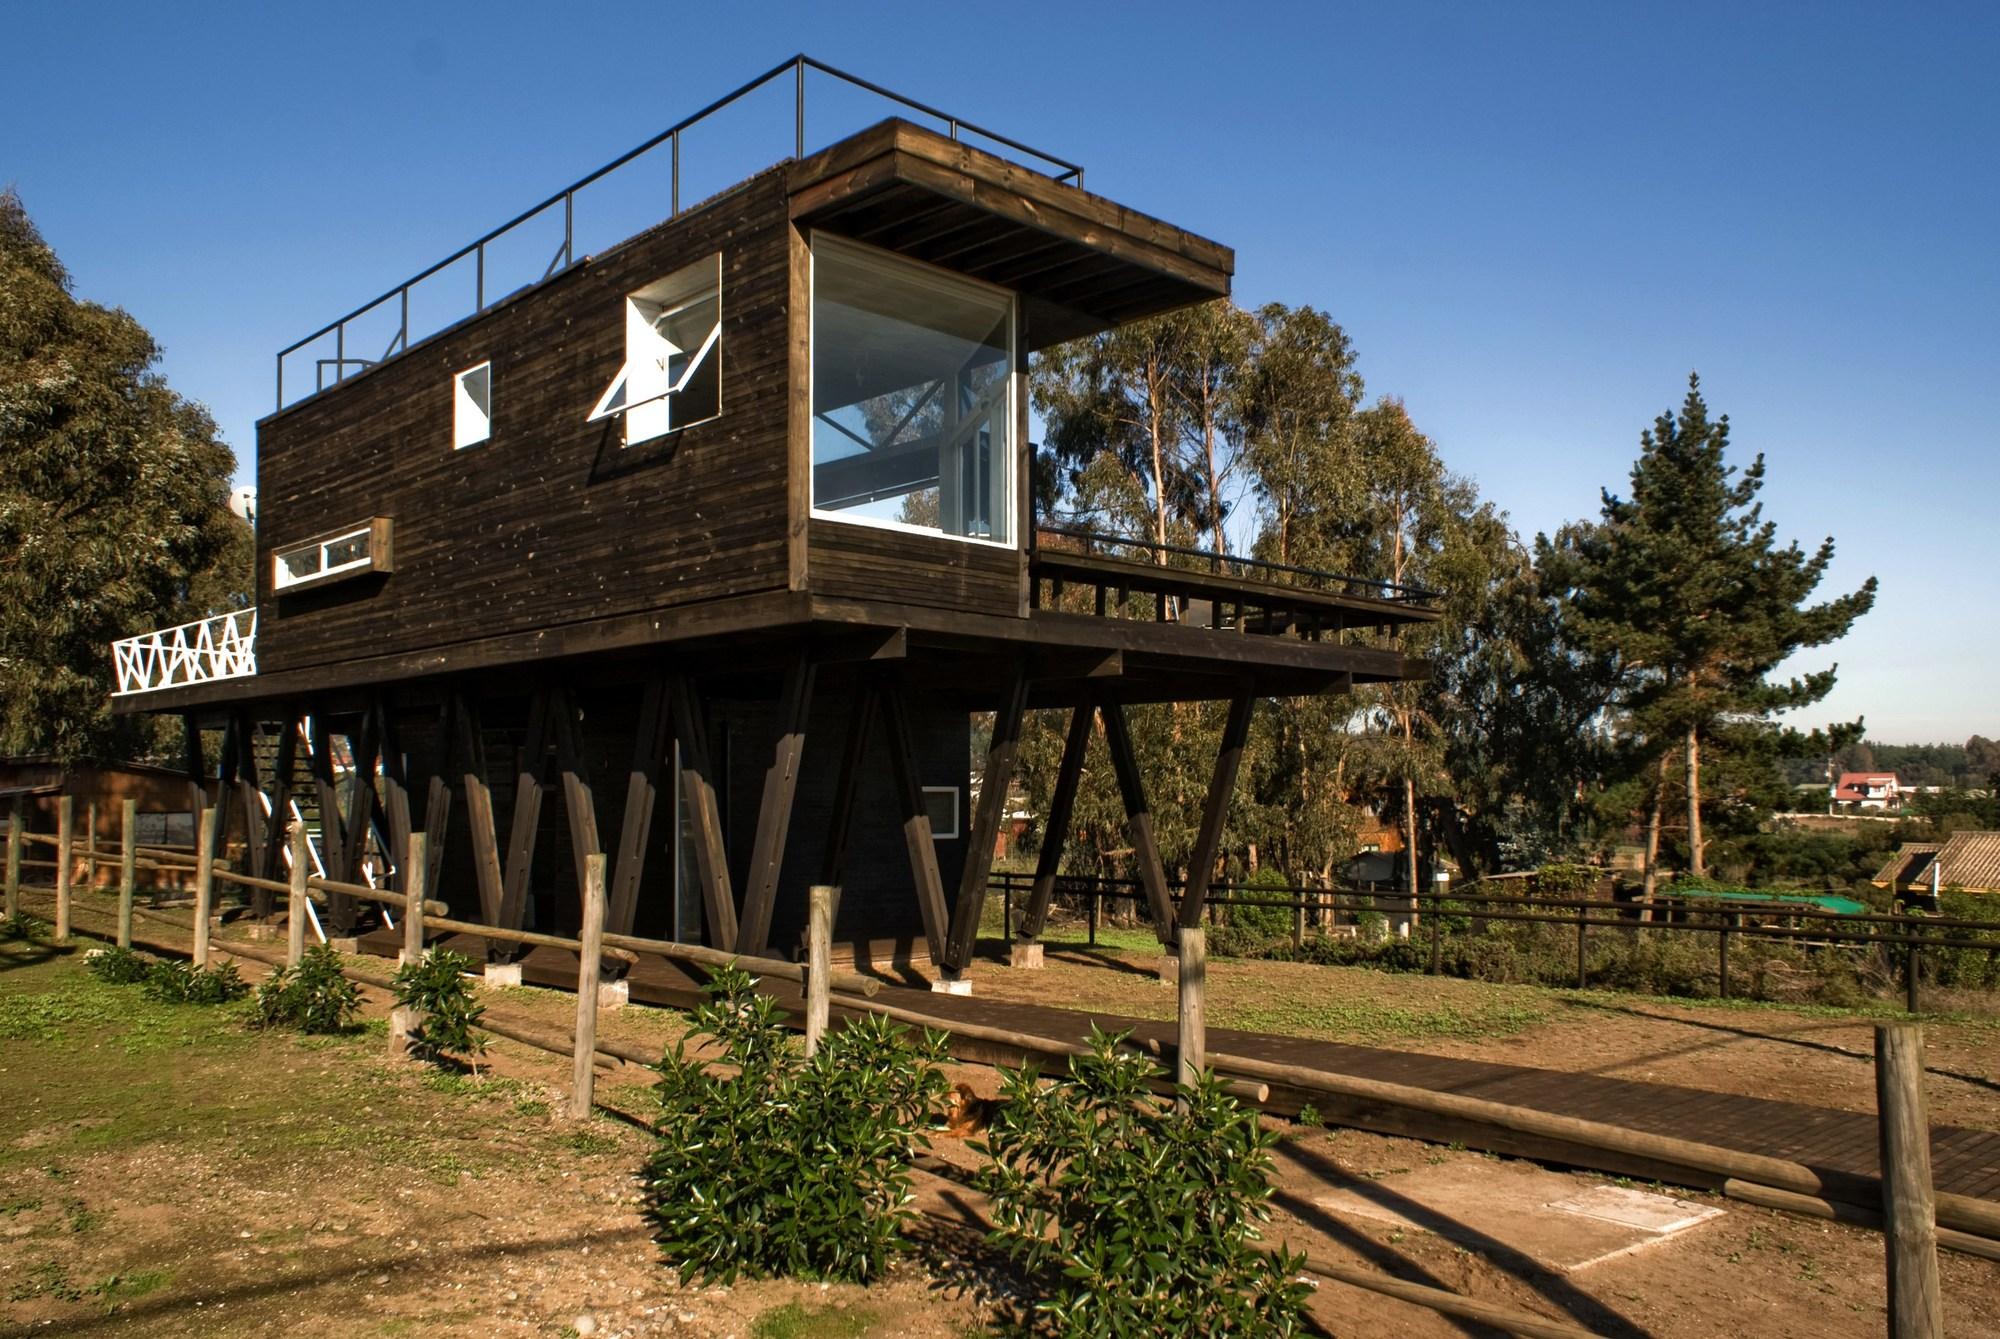 Casa cerro tacna drn architects archdaily m xico - Proyectos de casas rusticas ...